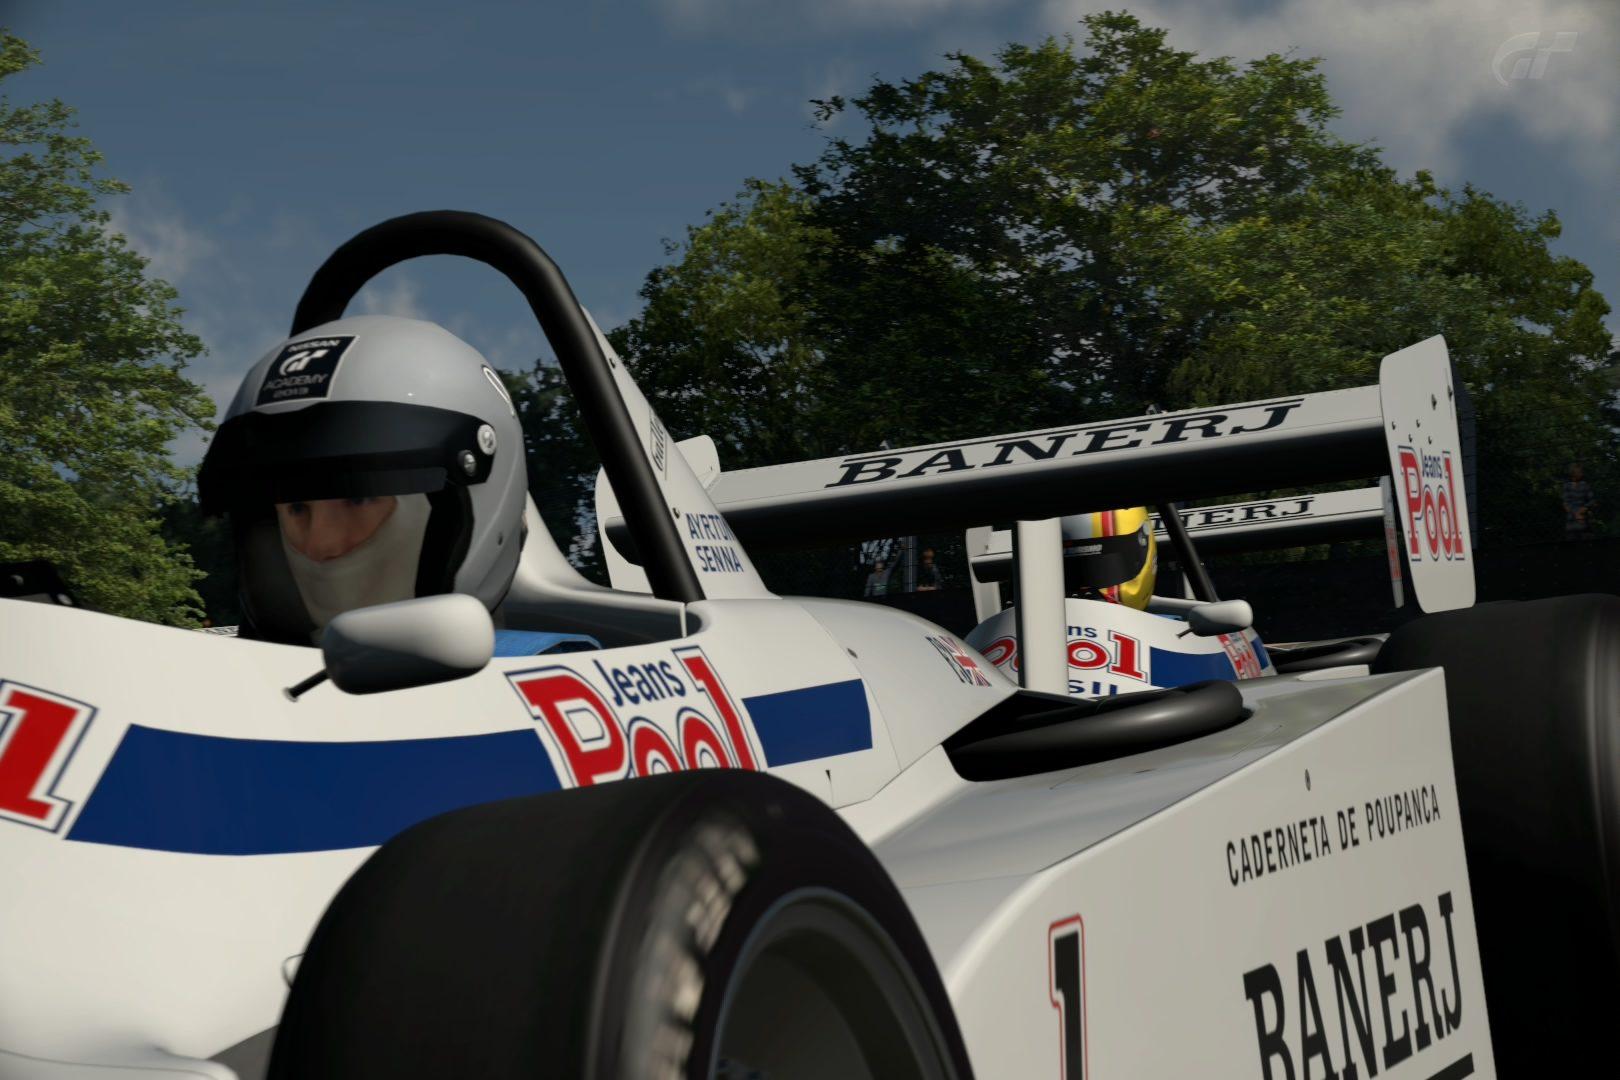 Brands Hatch Grand Prix Circuit '80s_14.jpg